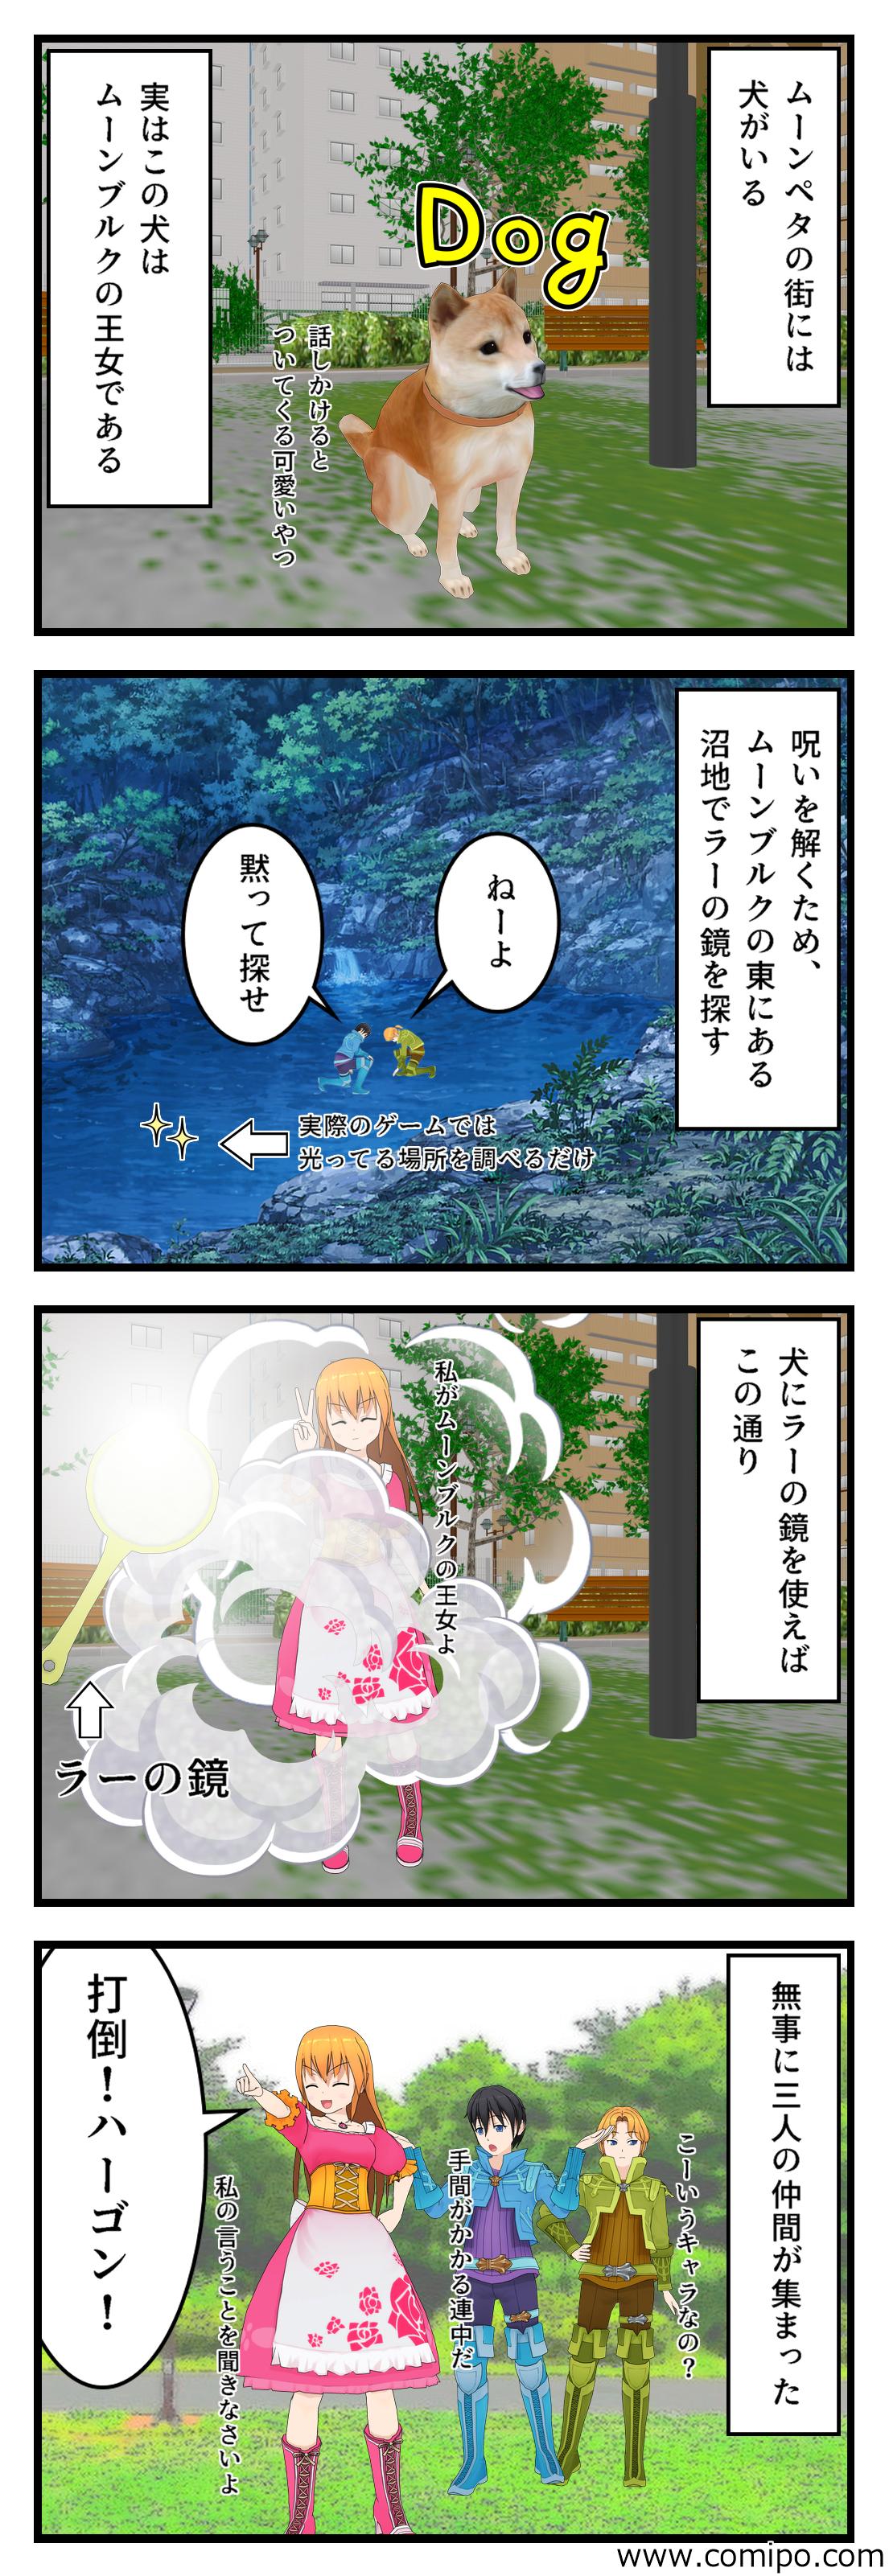 https://cdn-ak.f.st-hatena.com/images/fotolife/t/tomohiko37_i/20200813/20200813165748.png